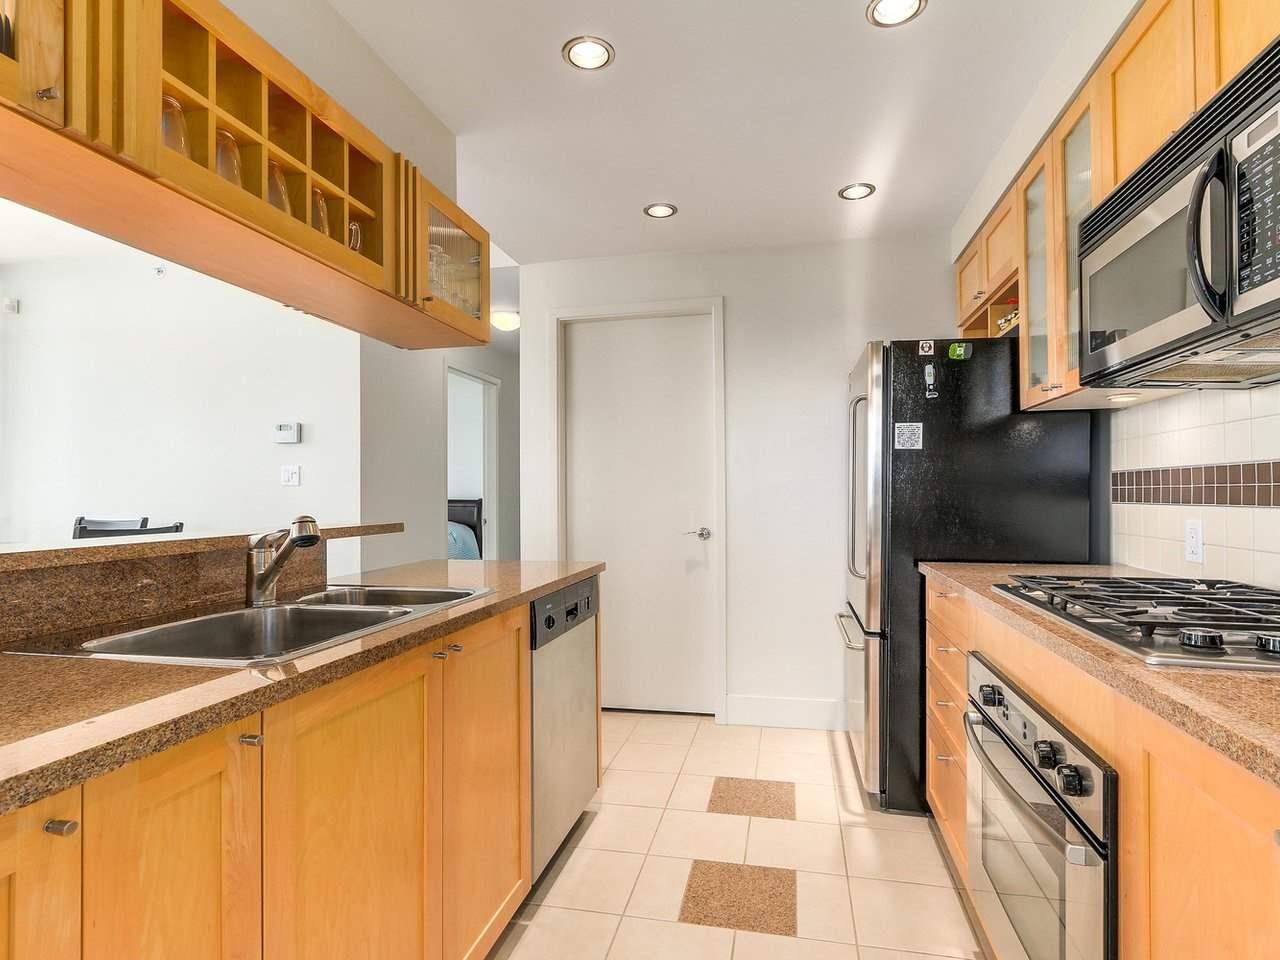 Condo Apartment at 1106 1483 HOMER STREET, Unit 1106, Vancouver West, British Columbia. Image 9